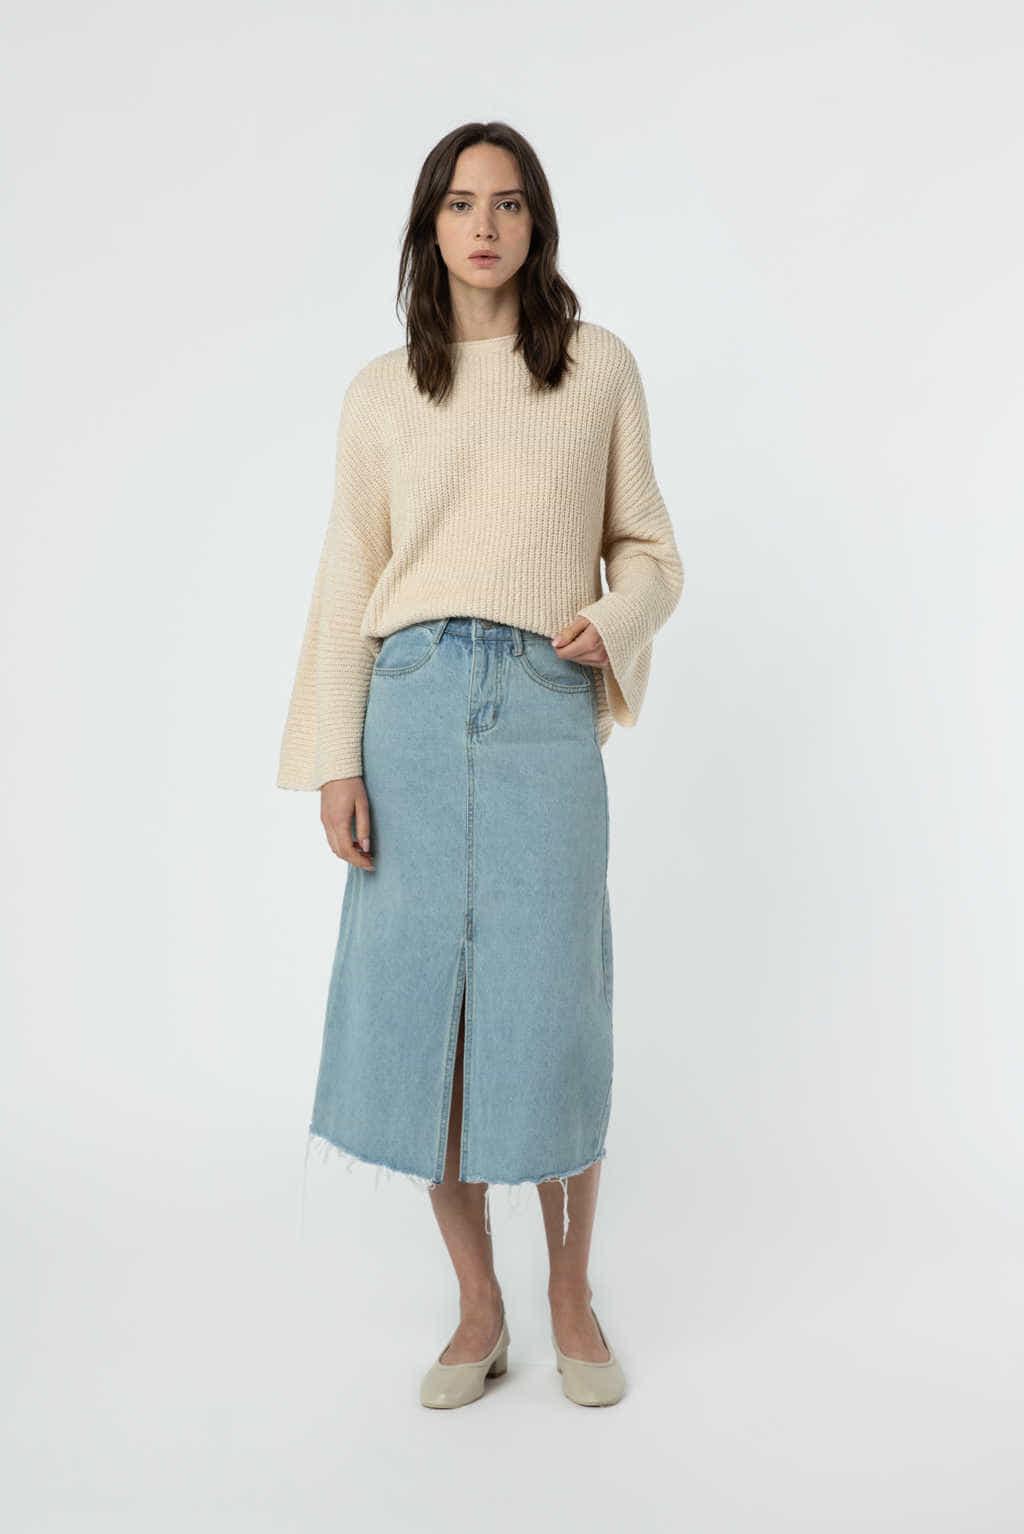 Sweater 2318 Cream 4